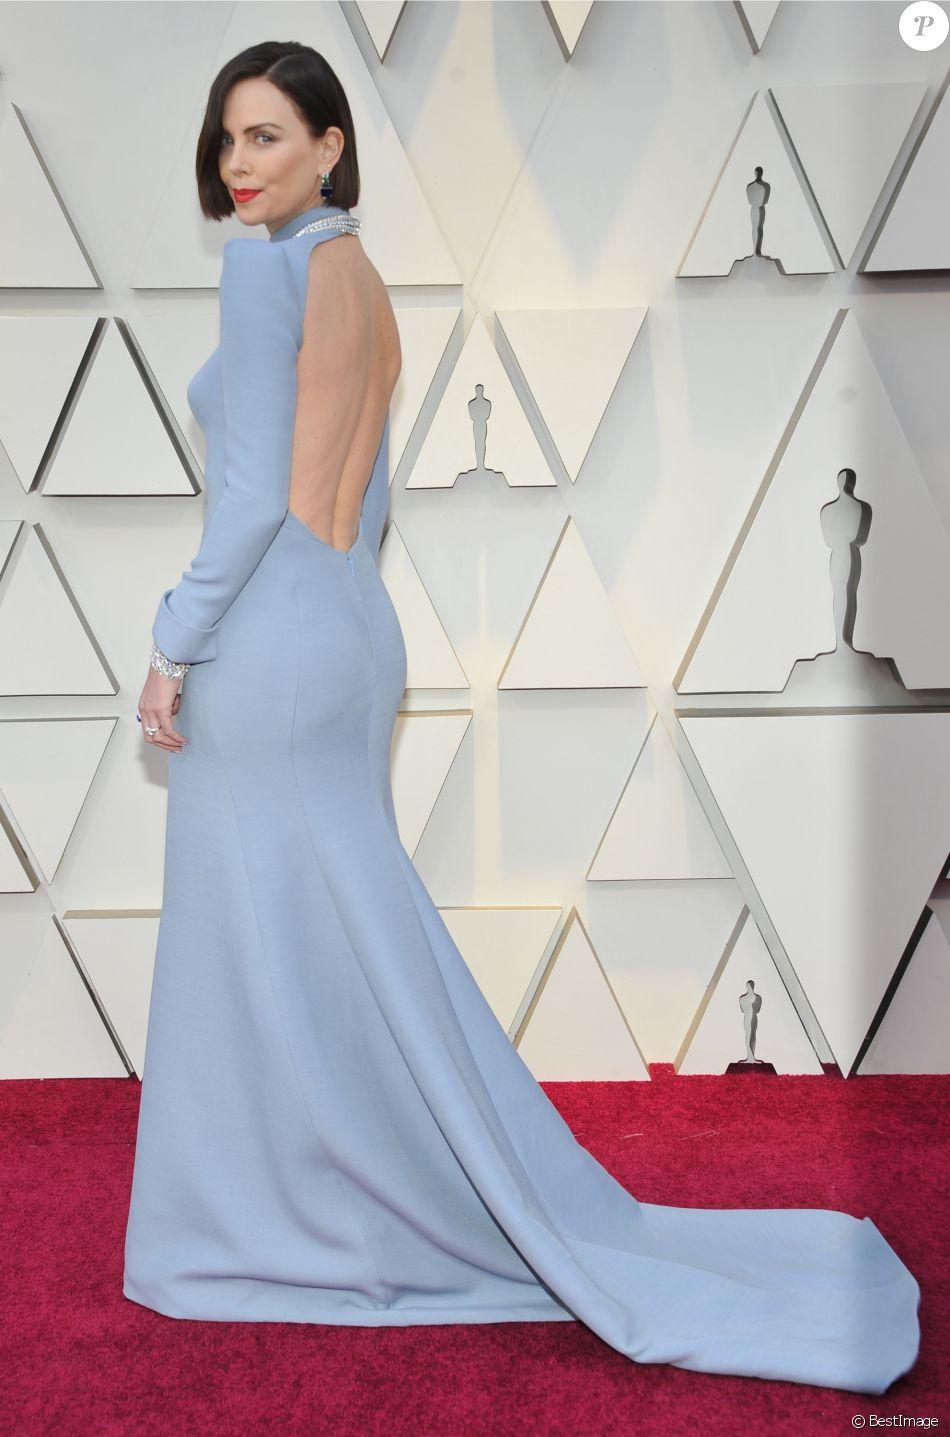 Charlize Theron lors du photocall des arrivées de la 91ème cérémonie des Oscars 2019 au théâtre Dolby à Hollywood, Los Angeles, Californie, Etats-Unis, le 24 février 2019.  Celebs attending the 91st Annual Academy Awards at Dolby theater in Hollywood, Los Angeles, CA, USA, on February 24, 2019.24/02/2019 - Los Angeles